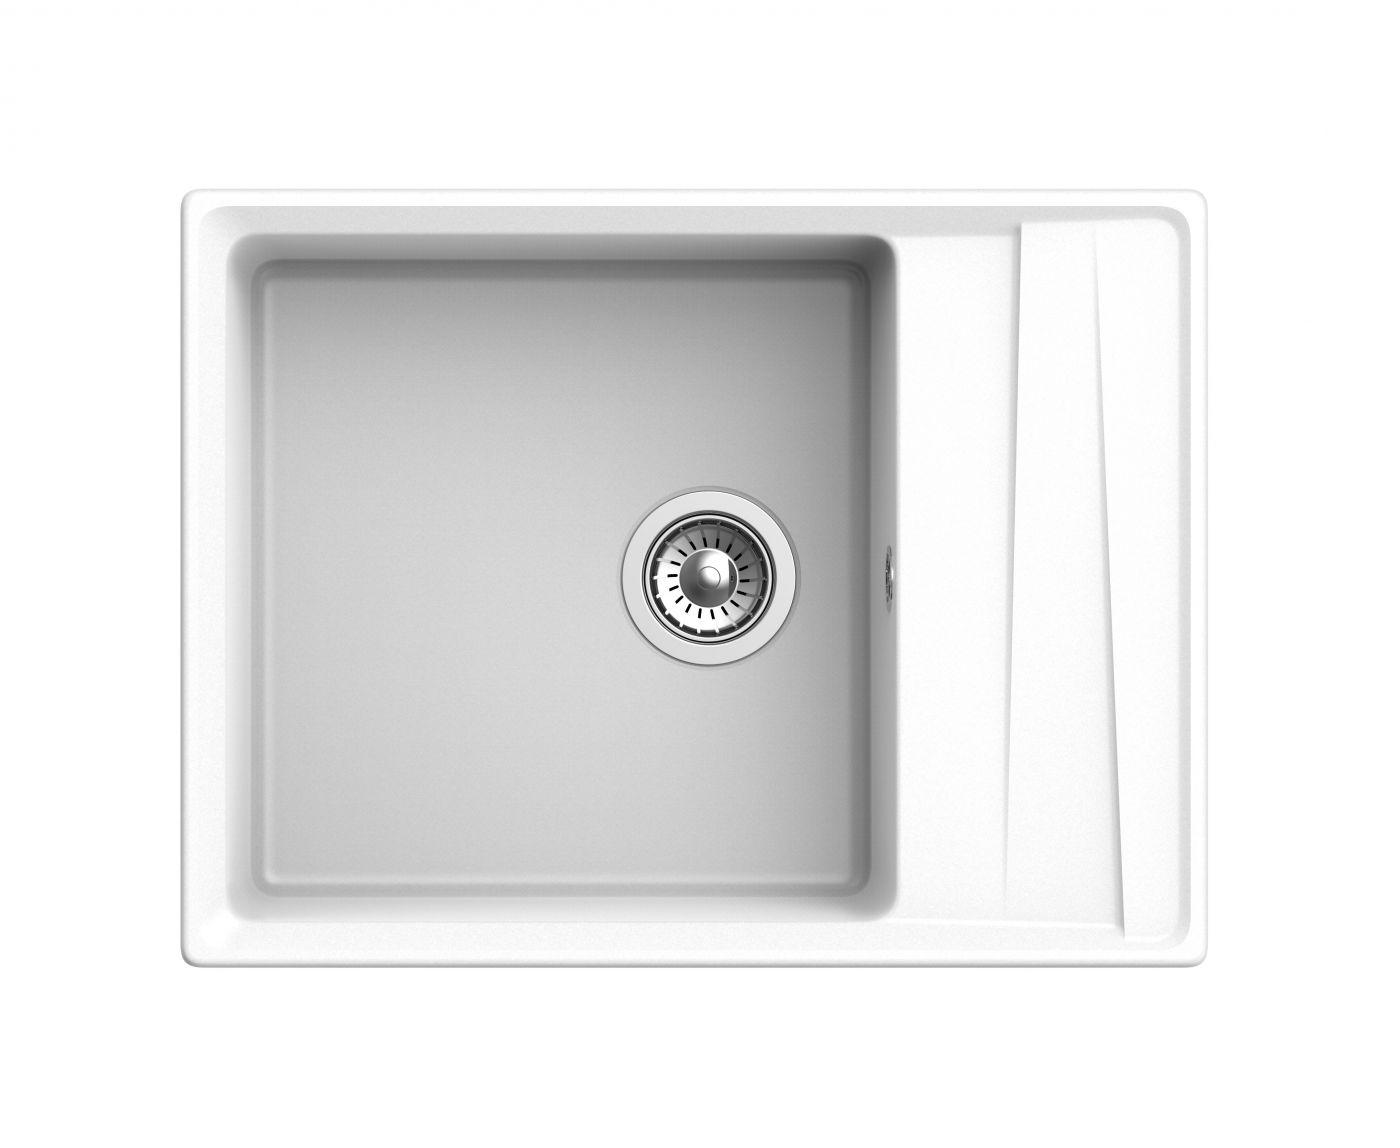 Мраморная мойка для кухни GranFest Level GF-LV660L Иней